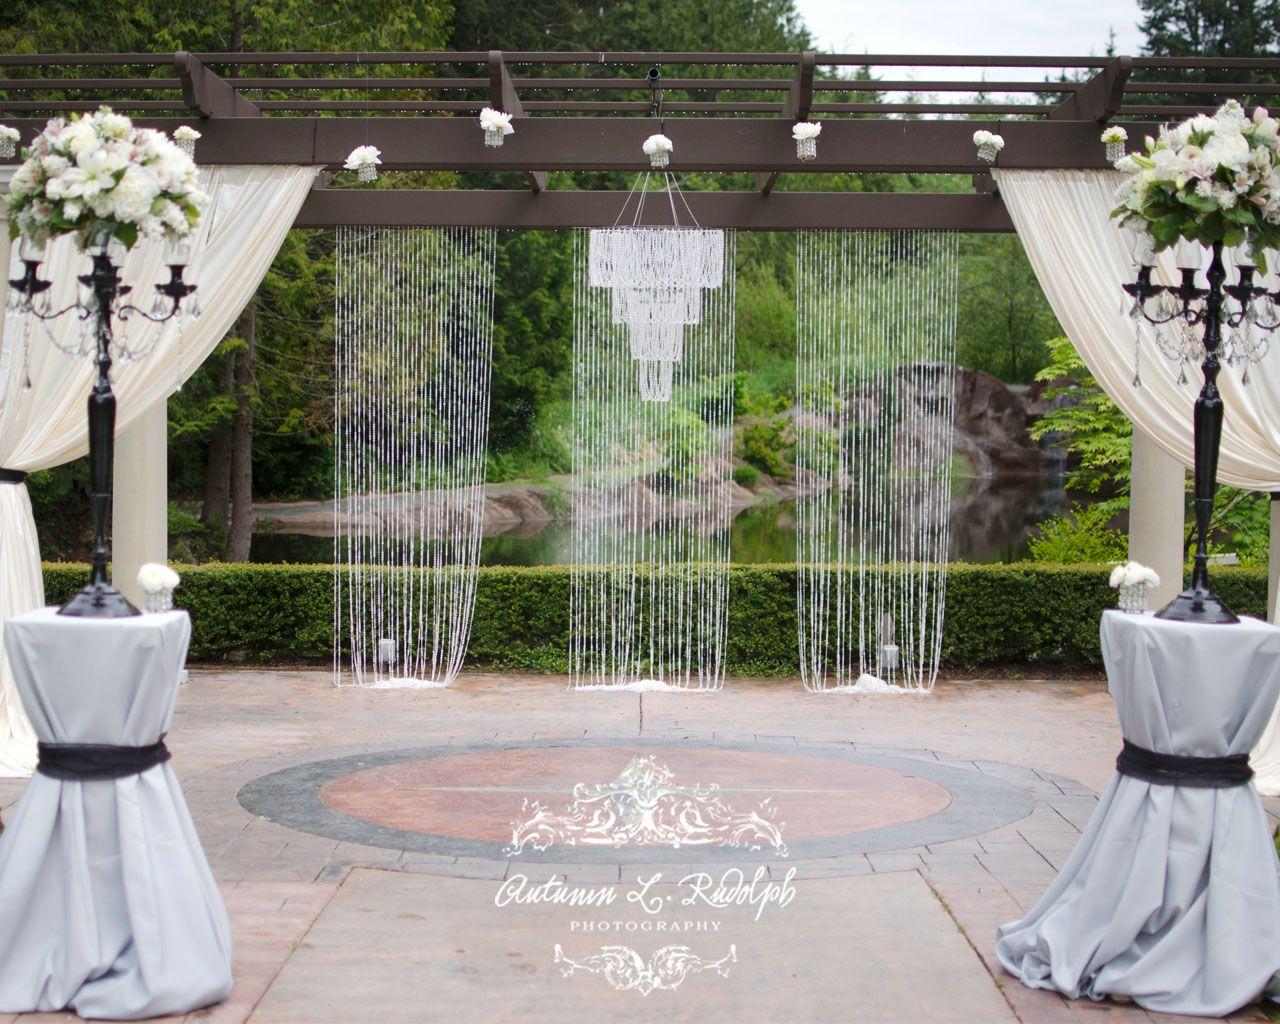 9ed1fc643e15b054b16bb53625d01a76 - Rock Creek Gardens Wedding And Event Venue